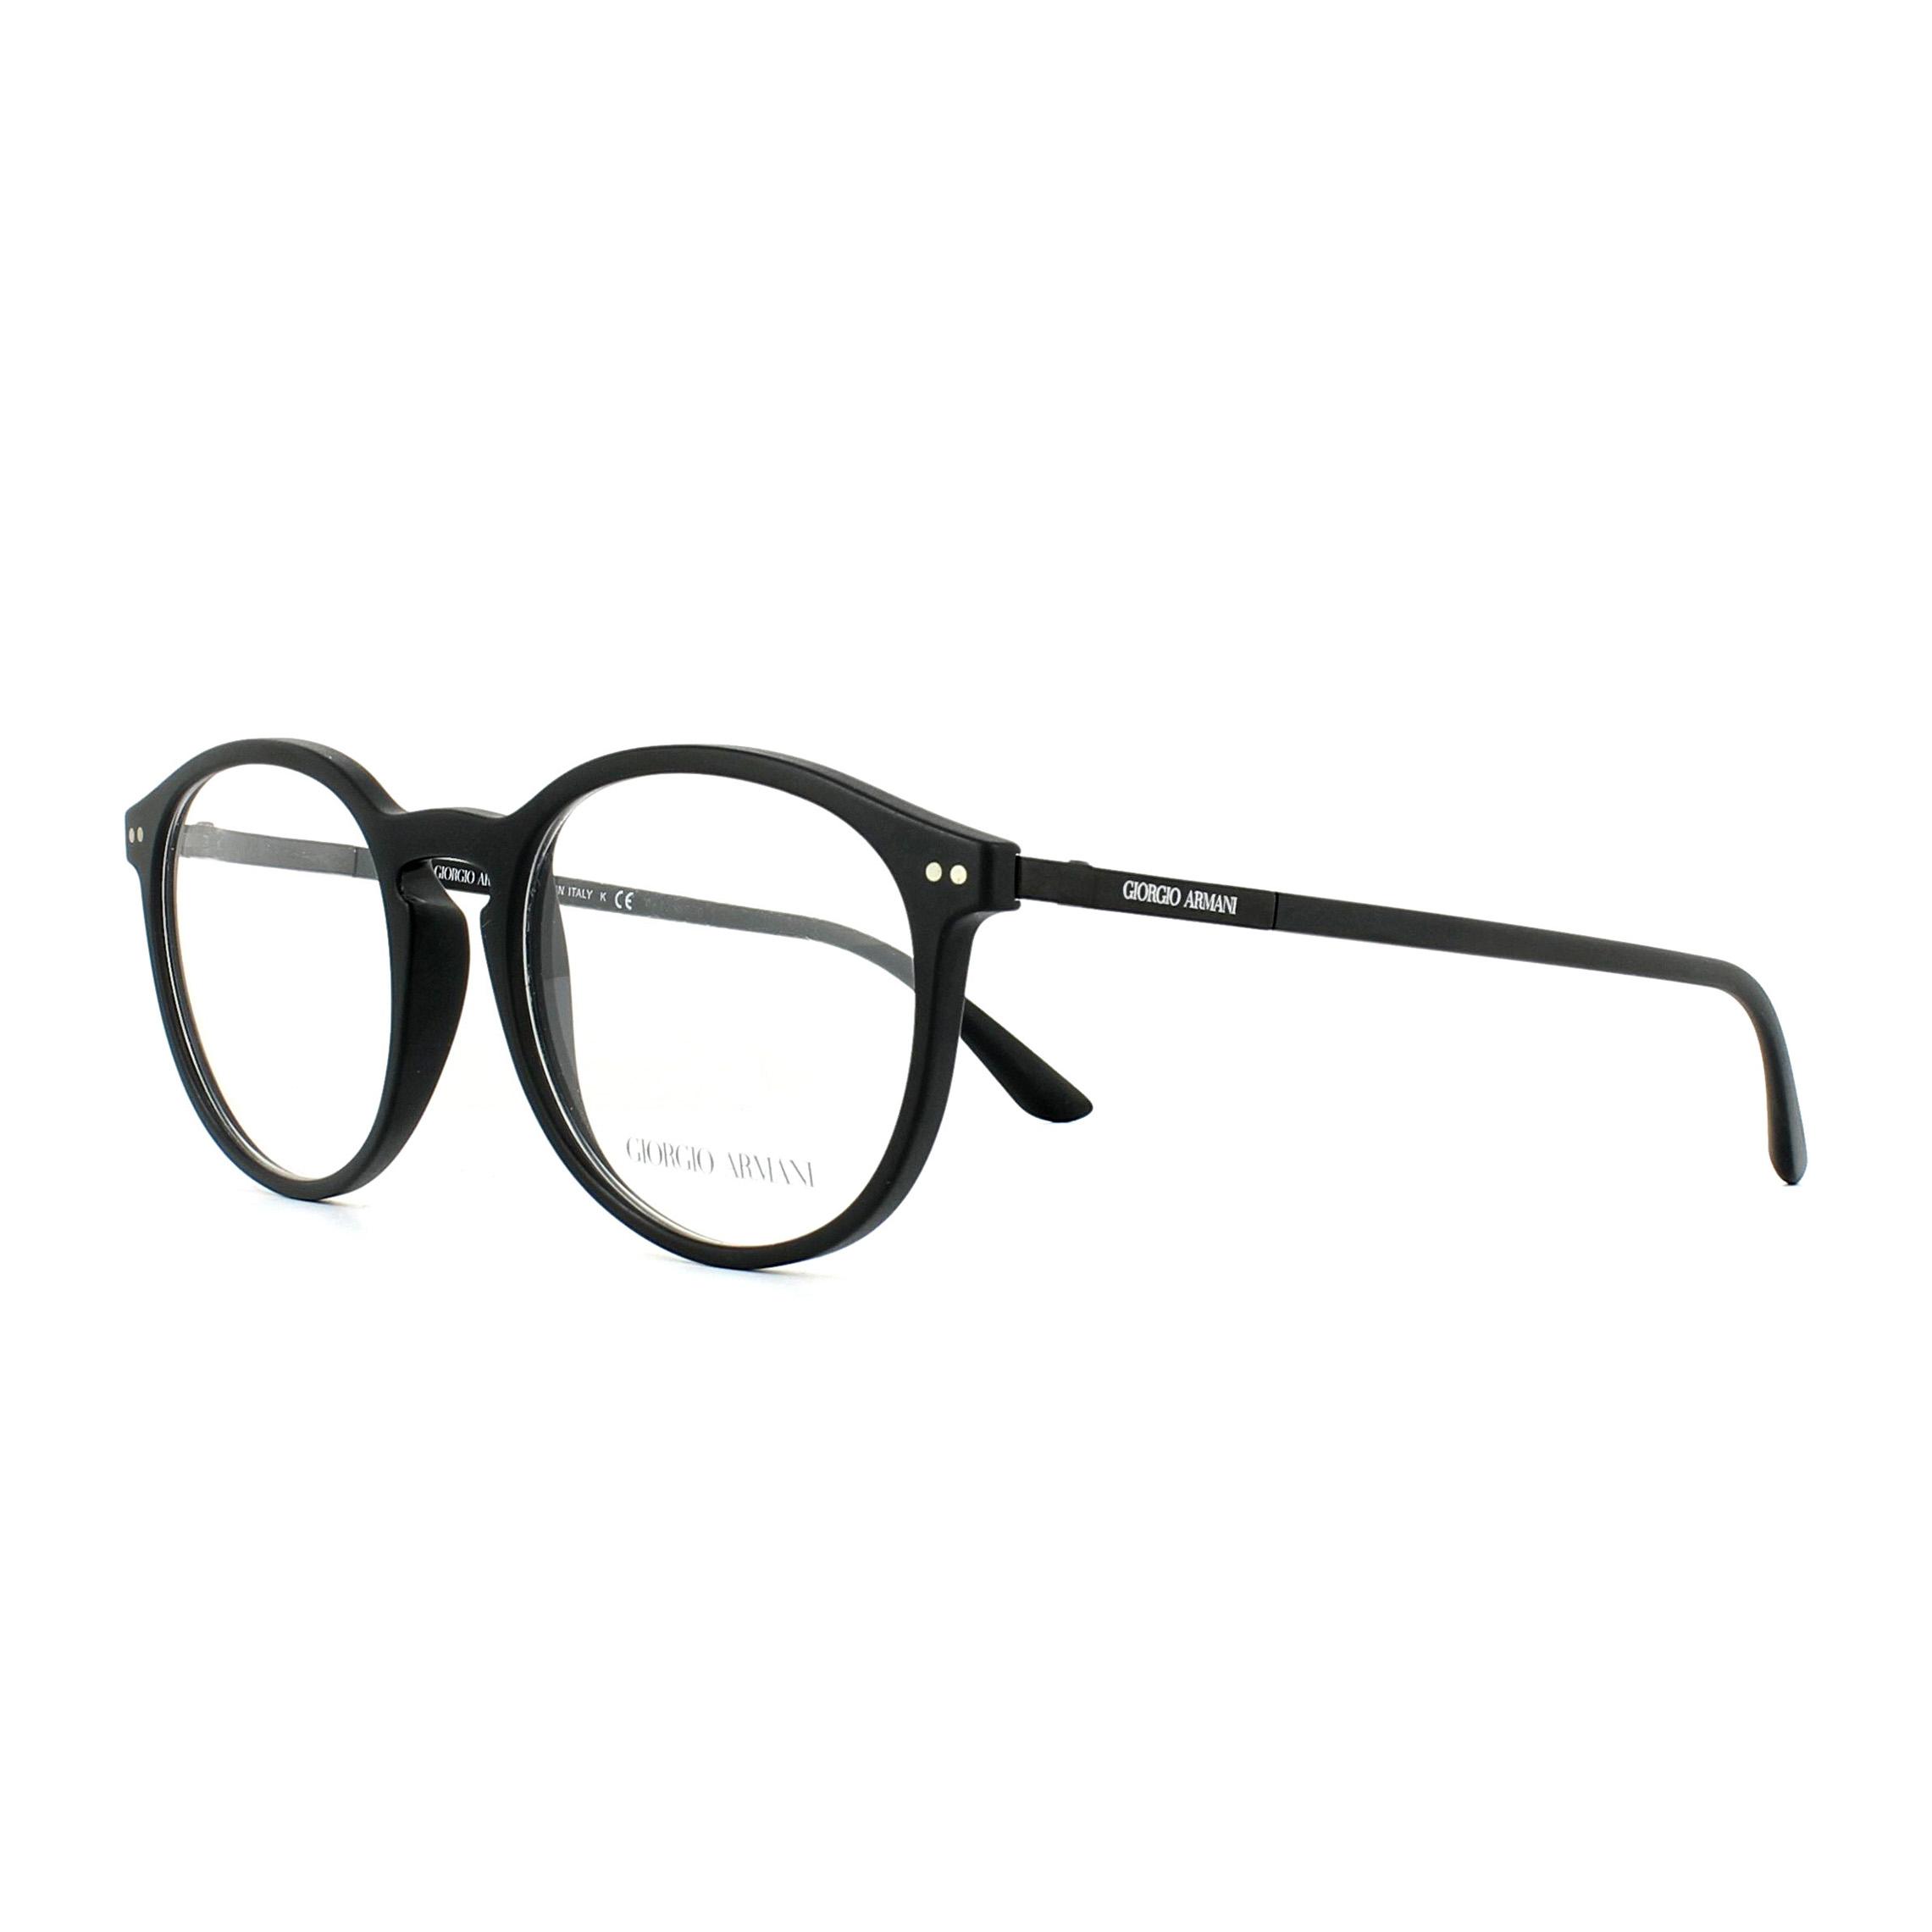 c34bfe3930f Sentinel Giorgio Armani Glasses Frames AR7121 5042 Matte Black 50mm Mens